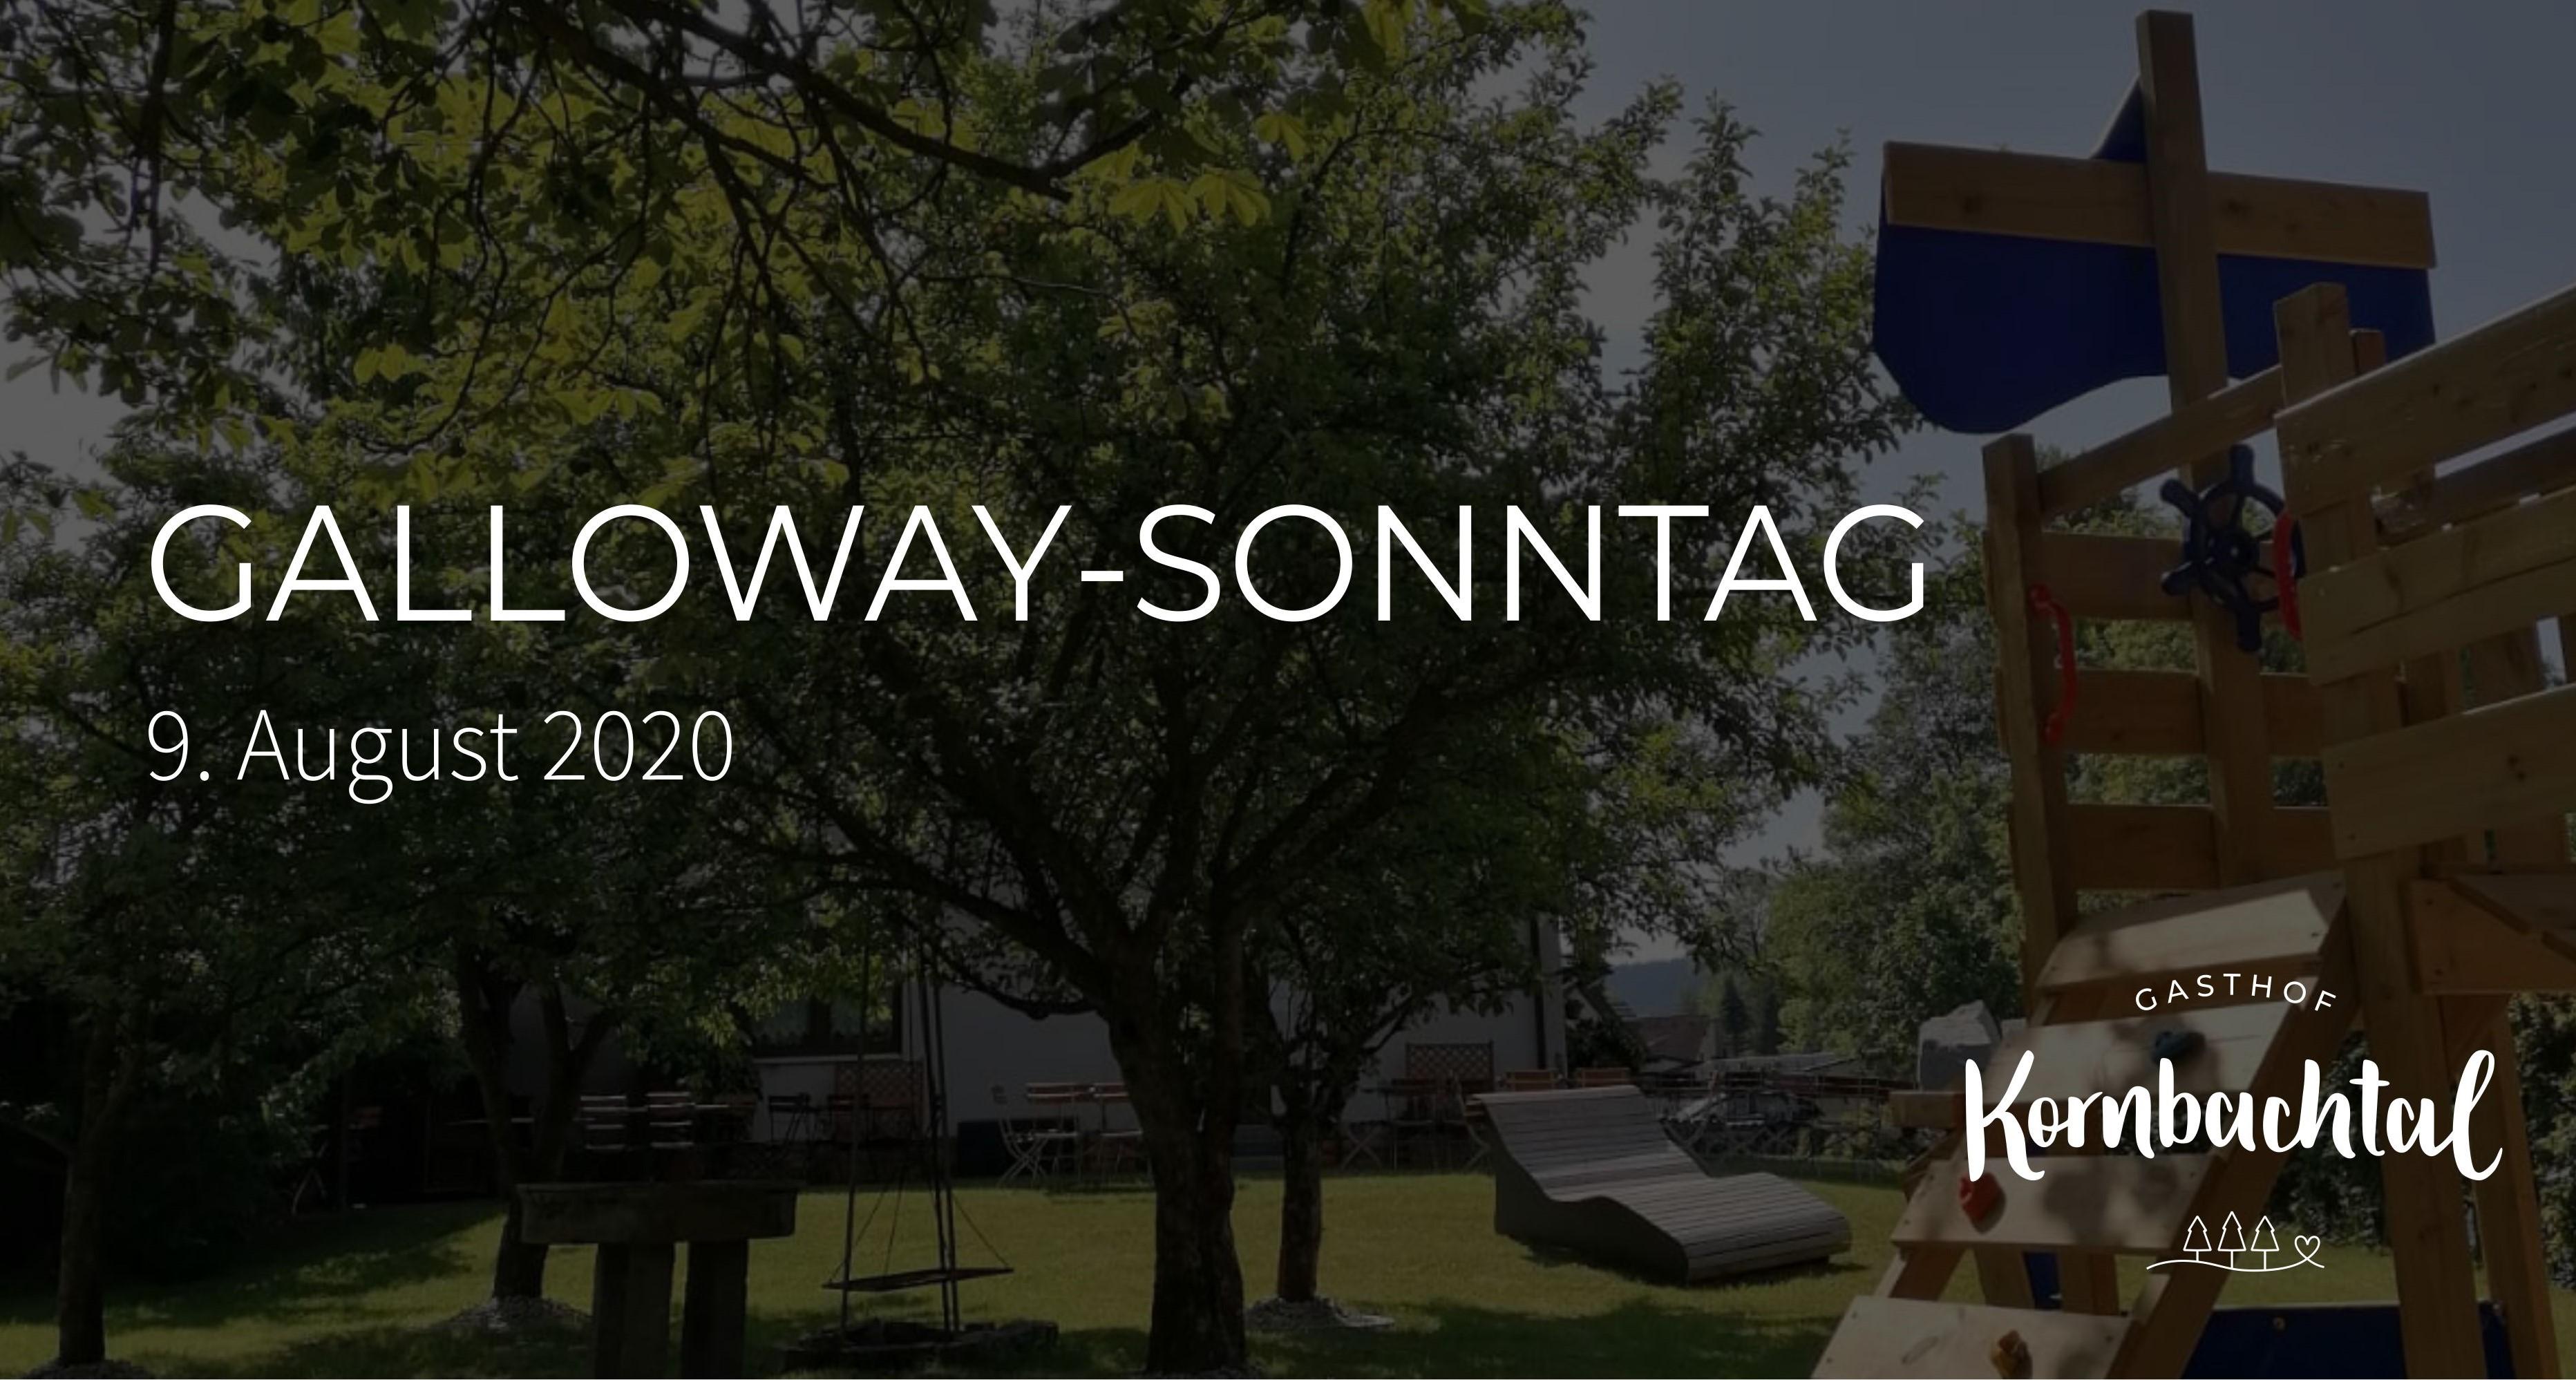 Galloway_Sonntag (2)